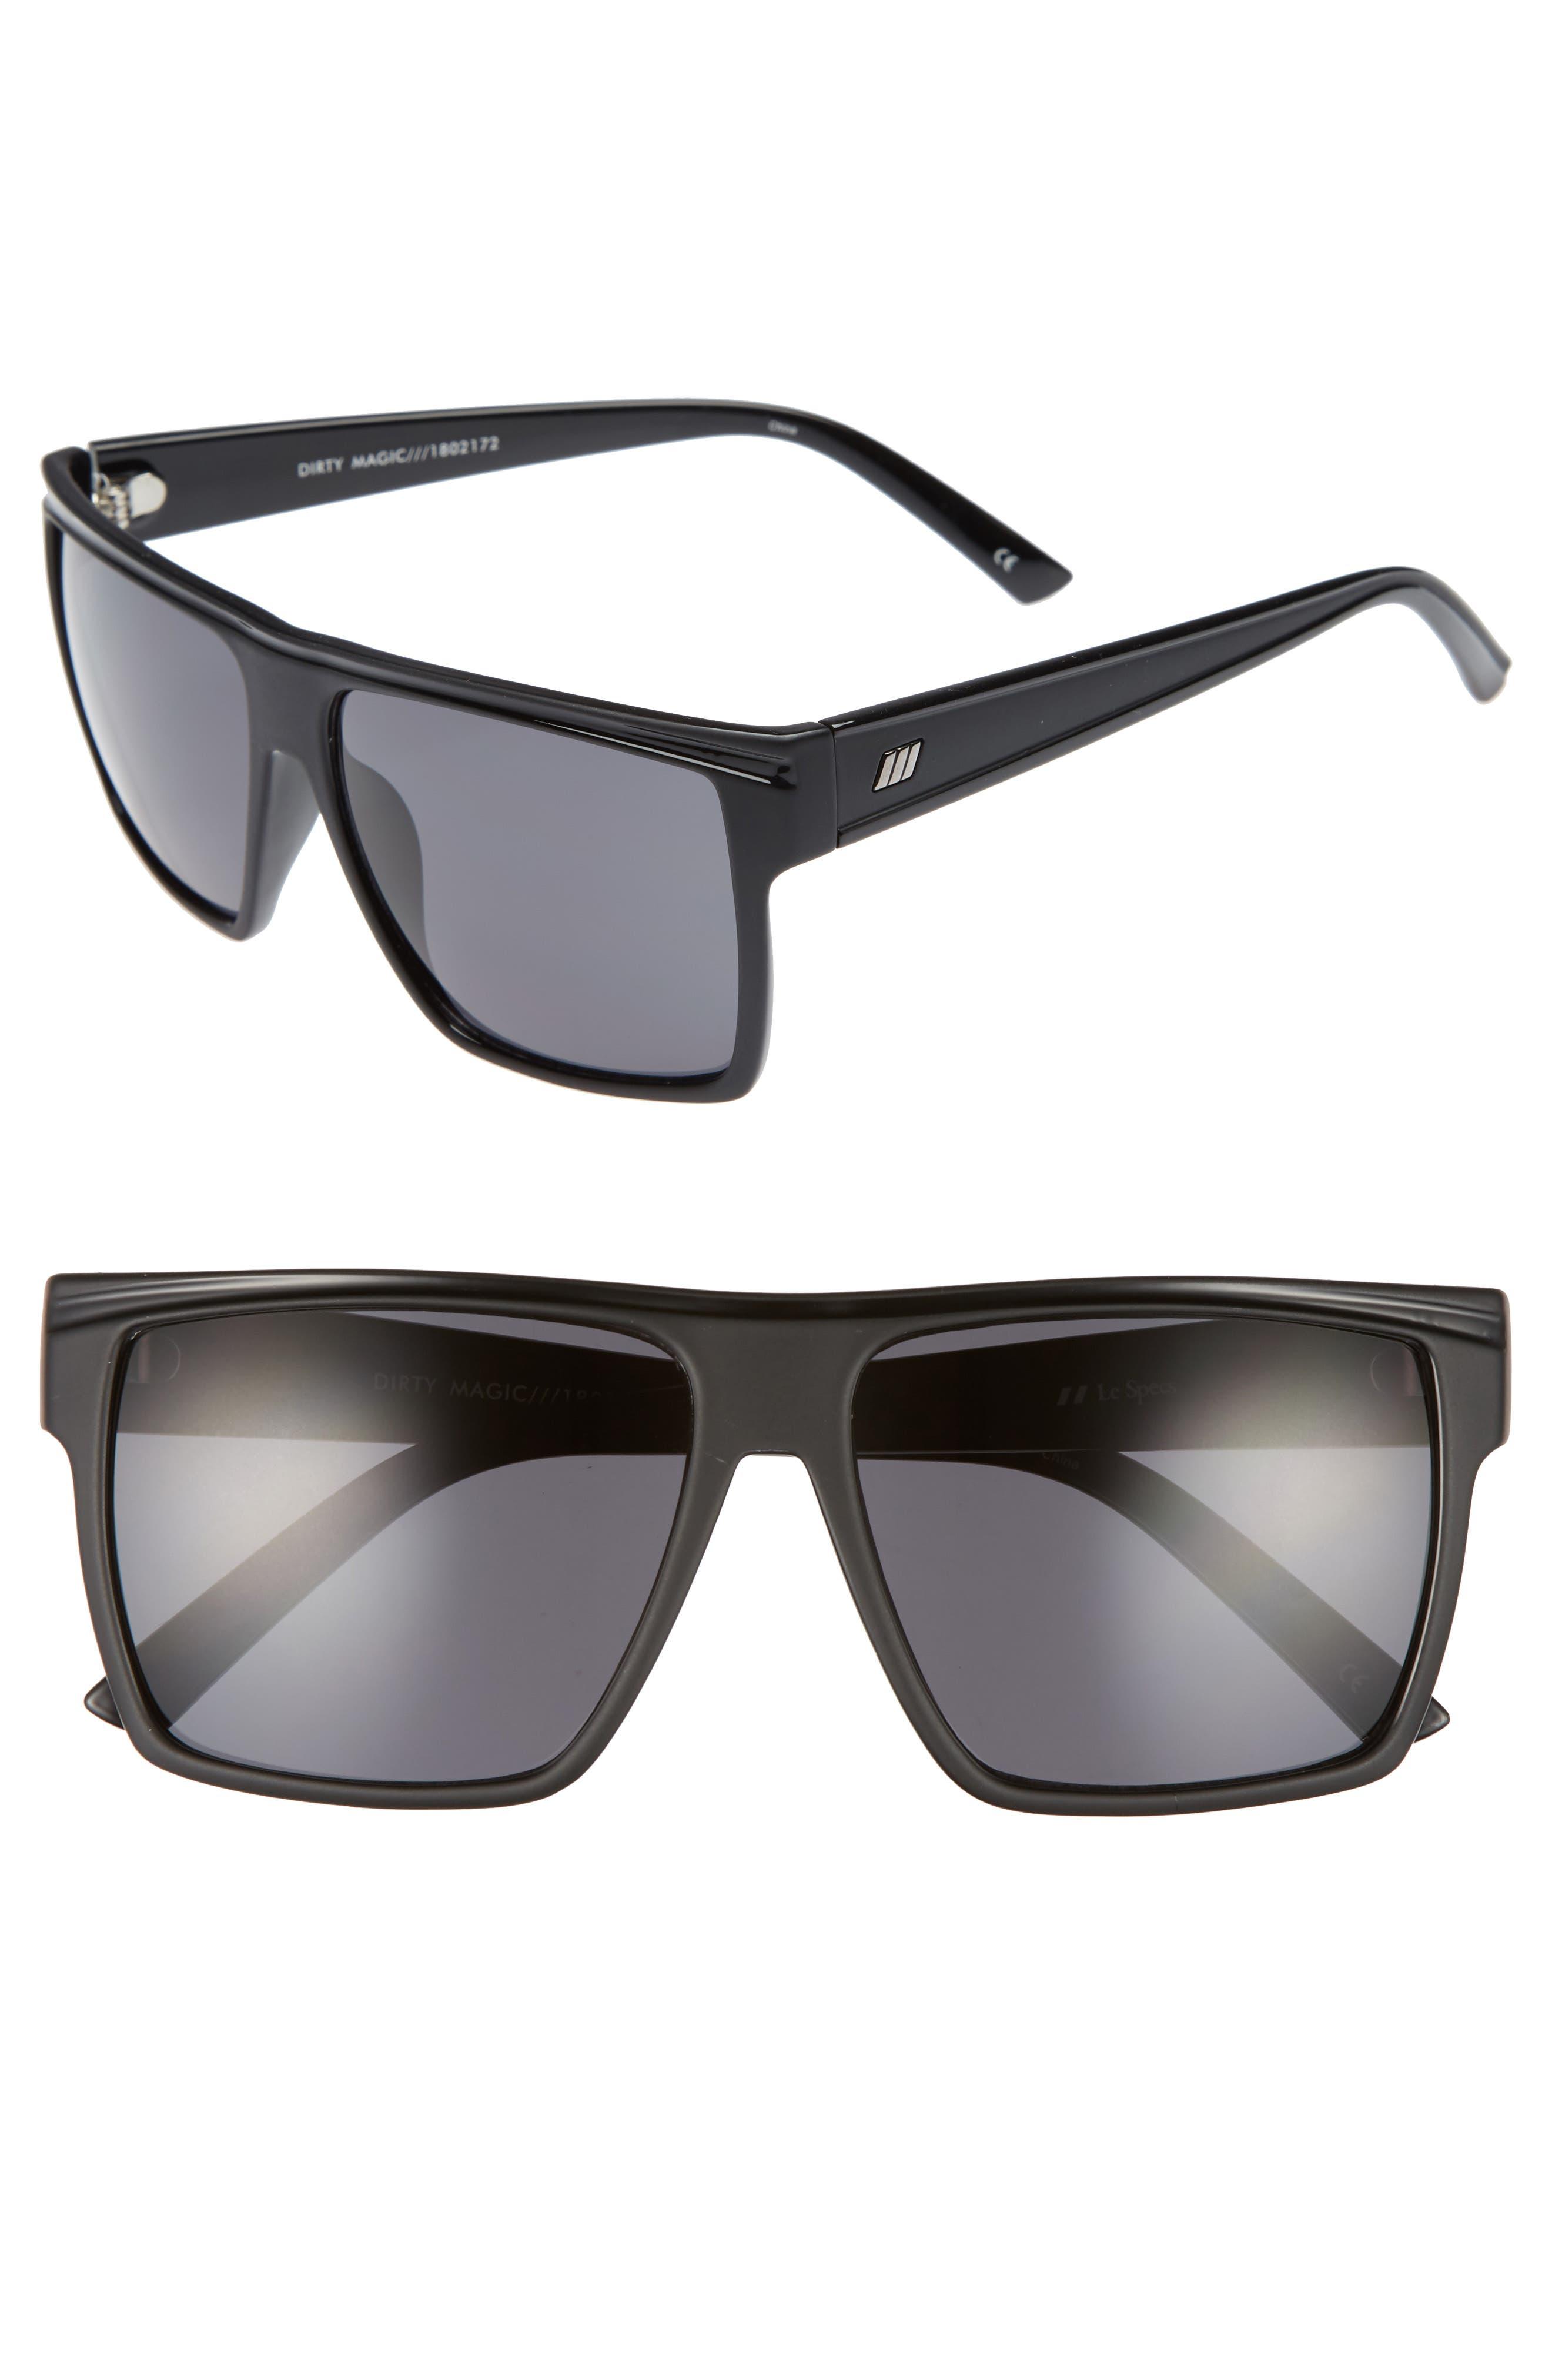 Main Image - Le Specs Dirty Magic 56mm Rectangle Sunglasses